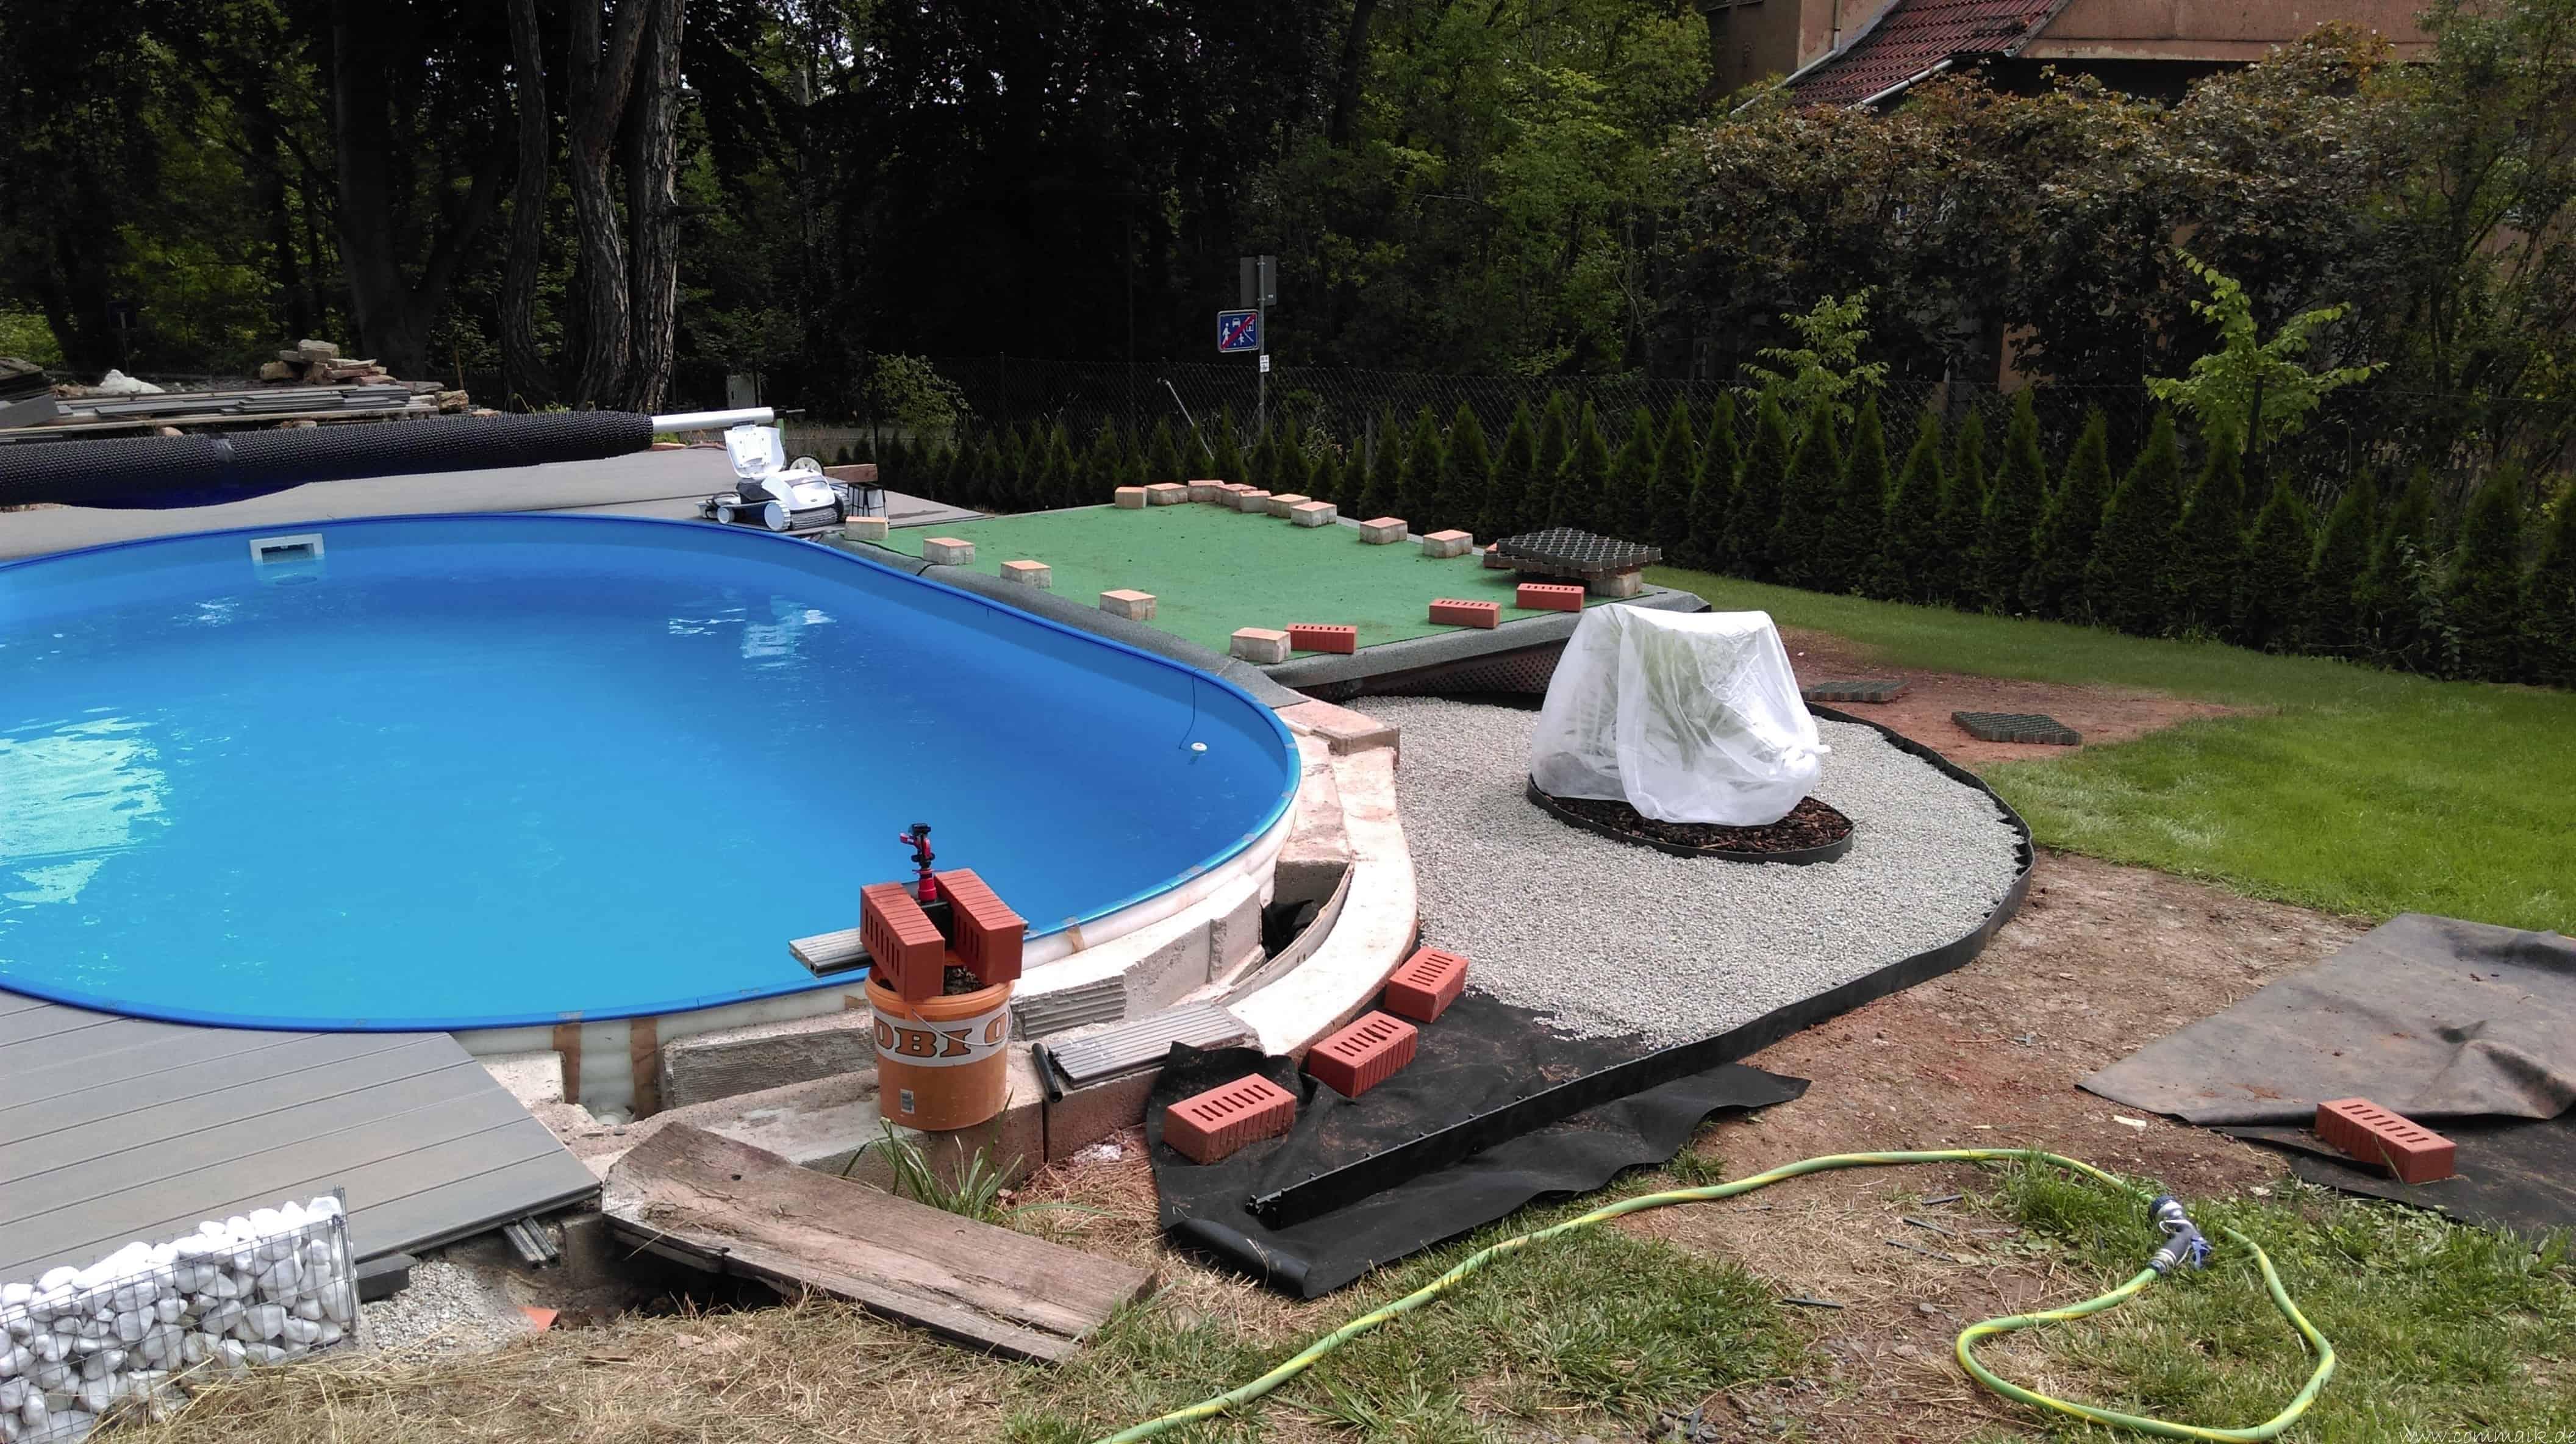 carrara kies und palmen am pool commaik. Black Bedroom Furniture Sets. Home Design Ideas